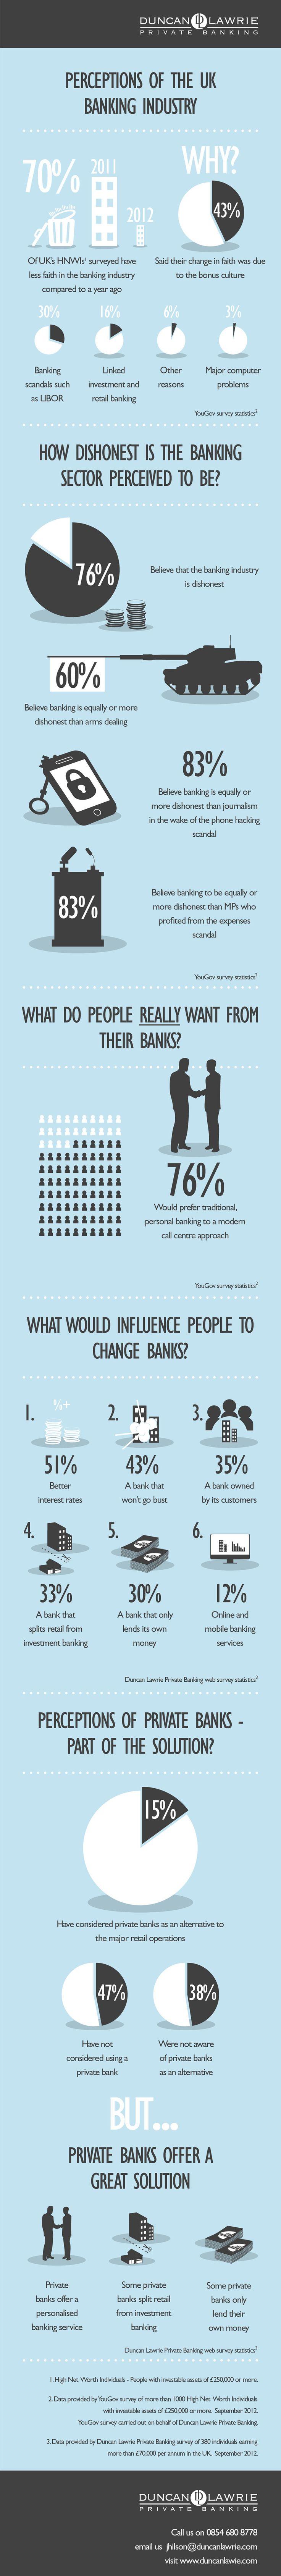 Perception of Banking Industry United Kingdom #Bank #infographics #UK